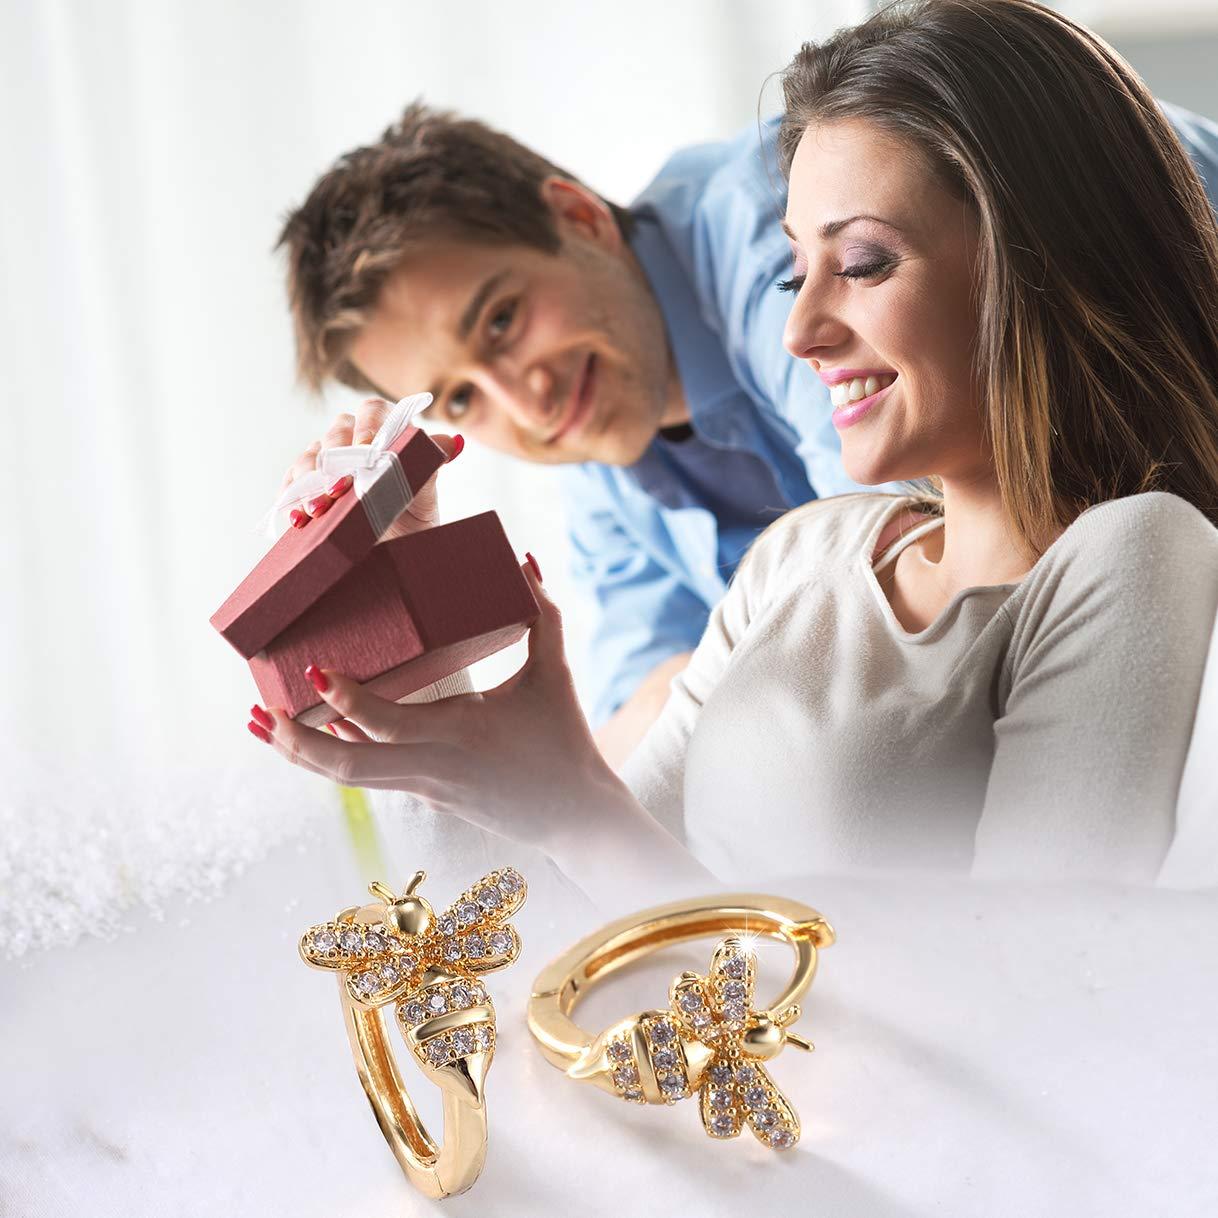 Richapex 18k Gold Plated Insect Earrings Cute Bumble Bee Hoop Earrings Vintage Animal Jewelry